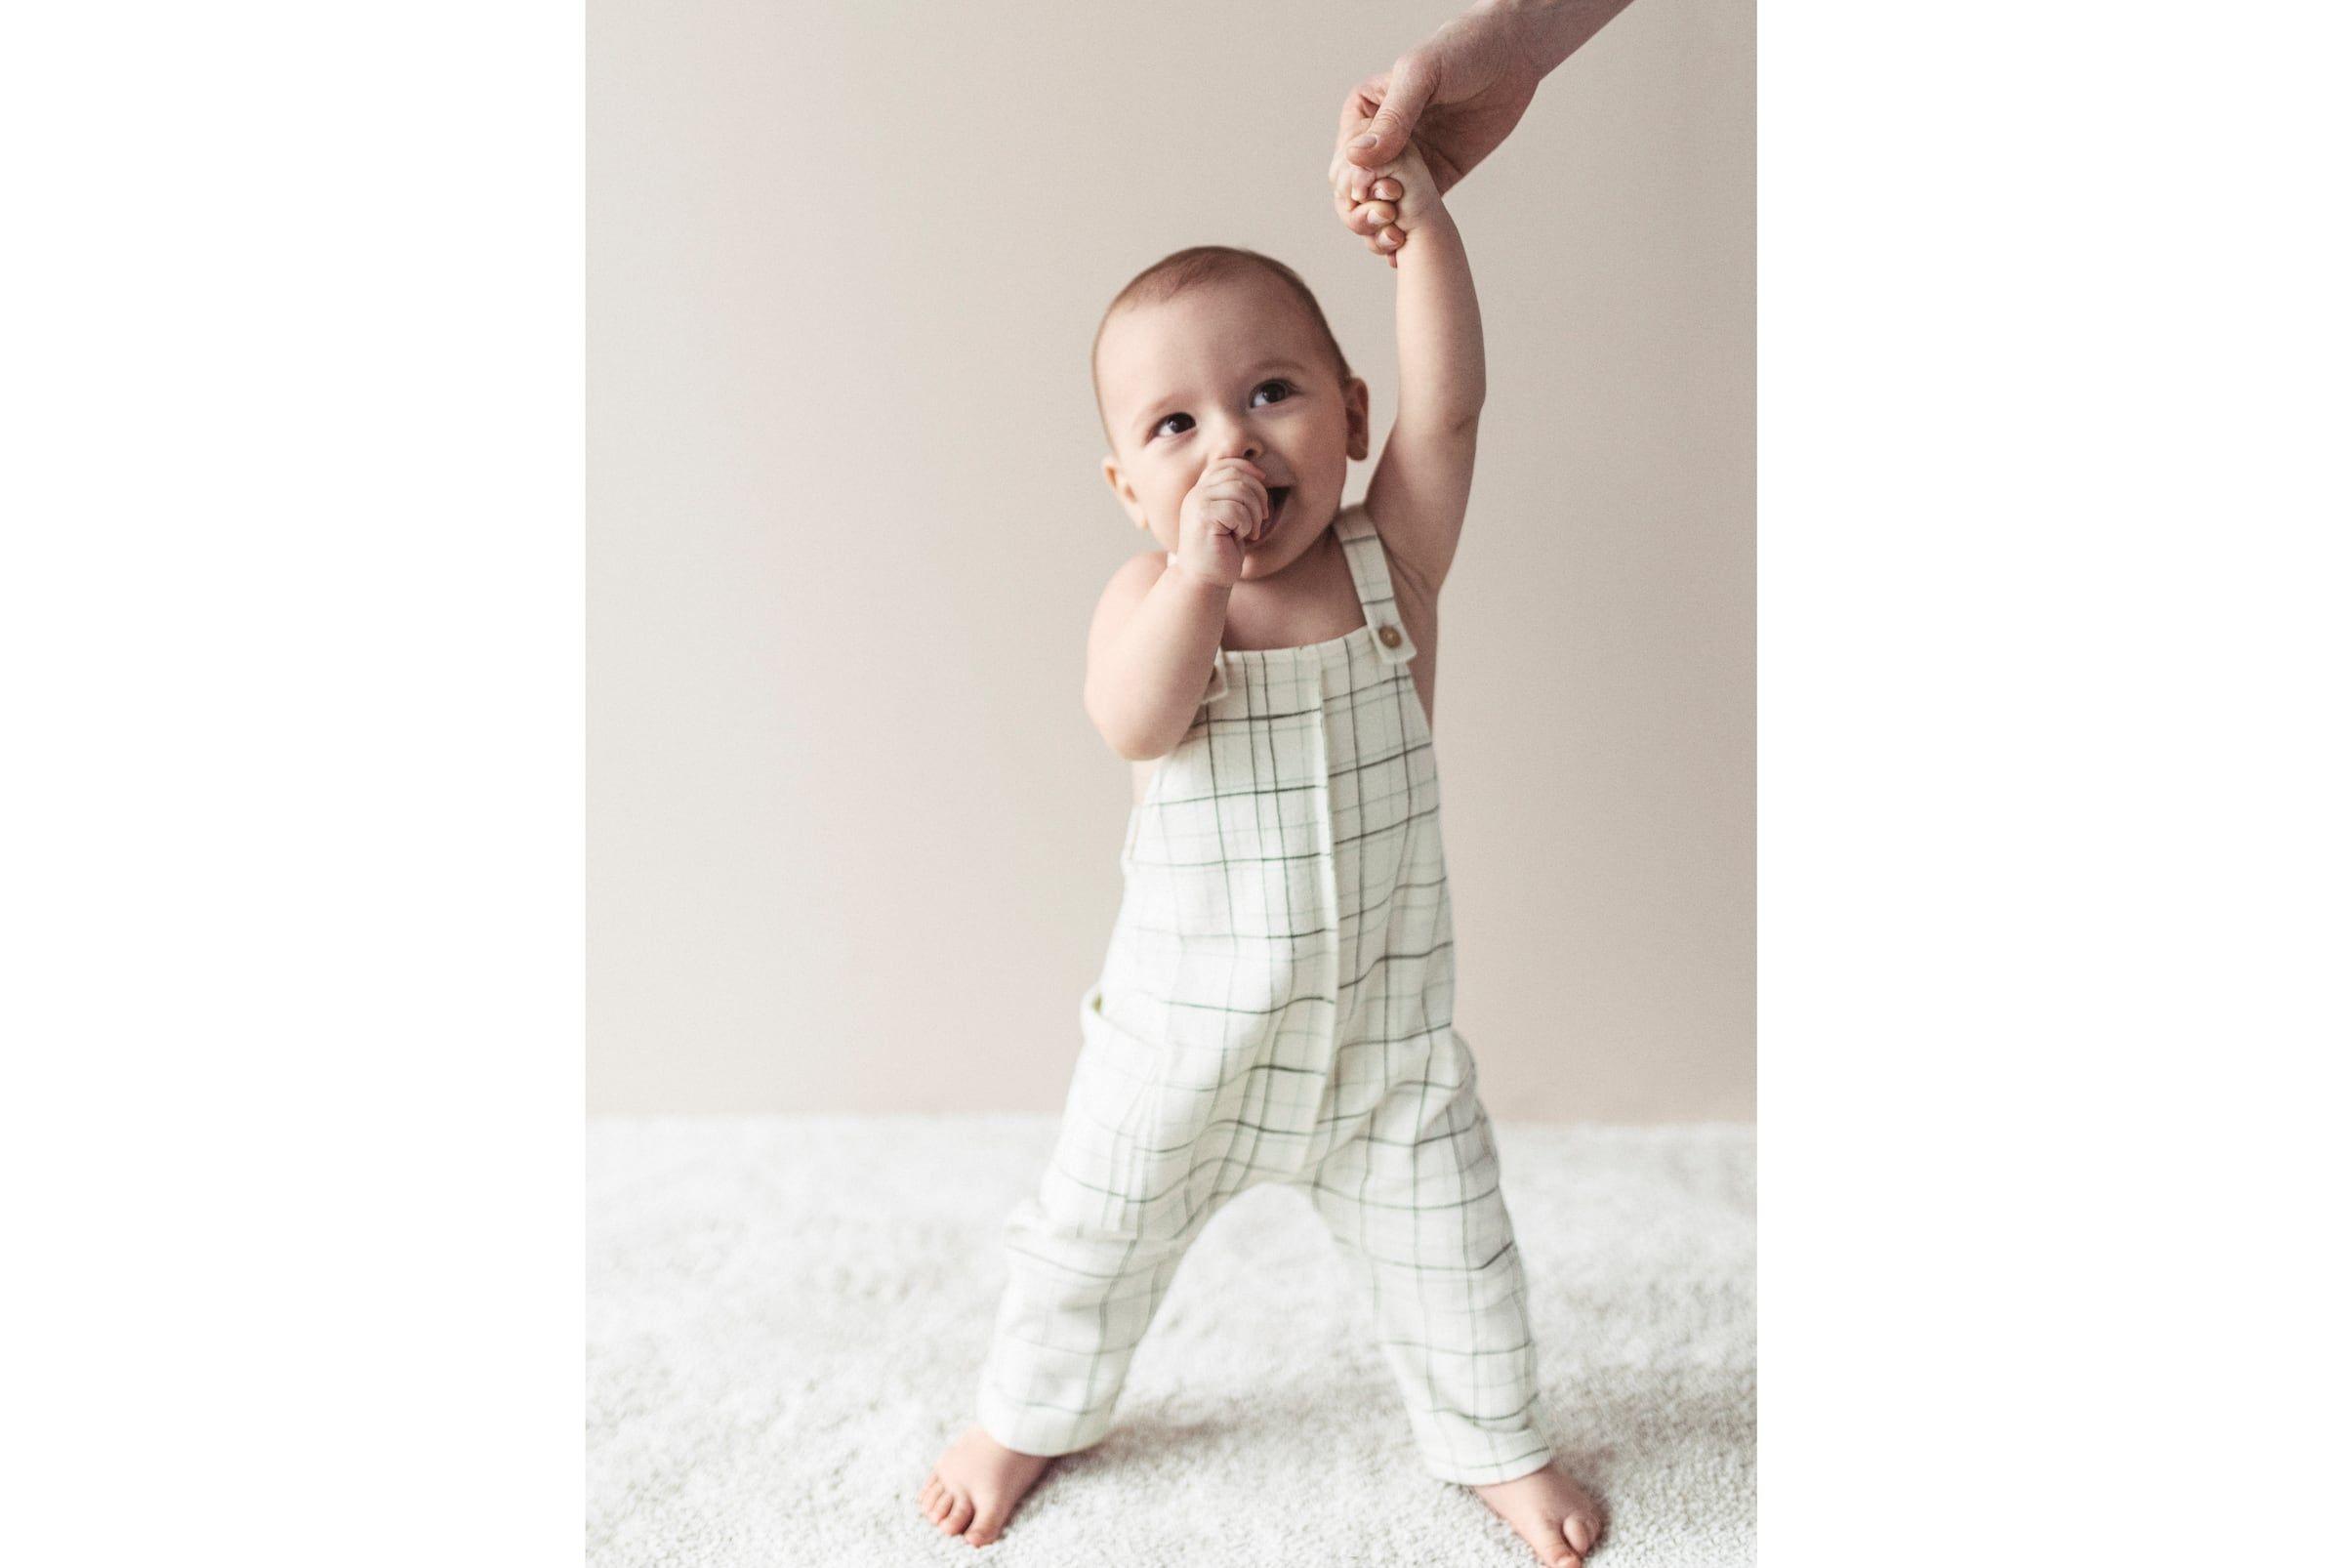 Newborn Baby Fashion Zara United States In 2020 Baby Fashion Zara Fashion Newborn Baby